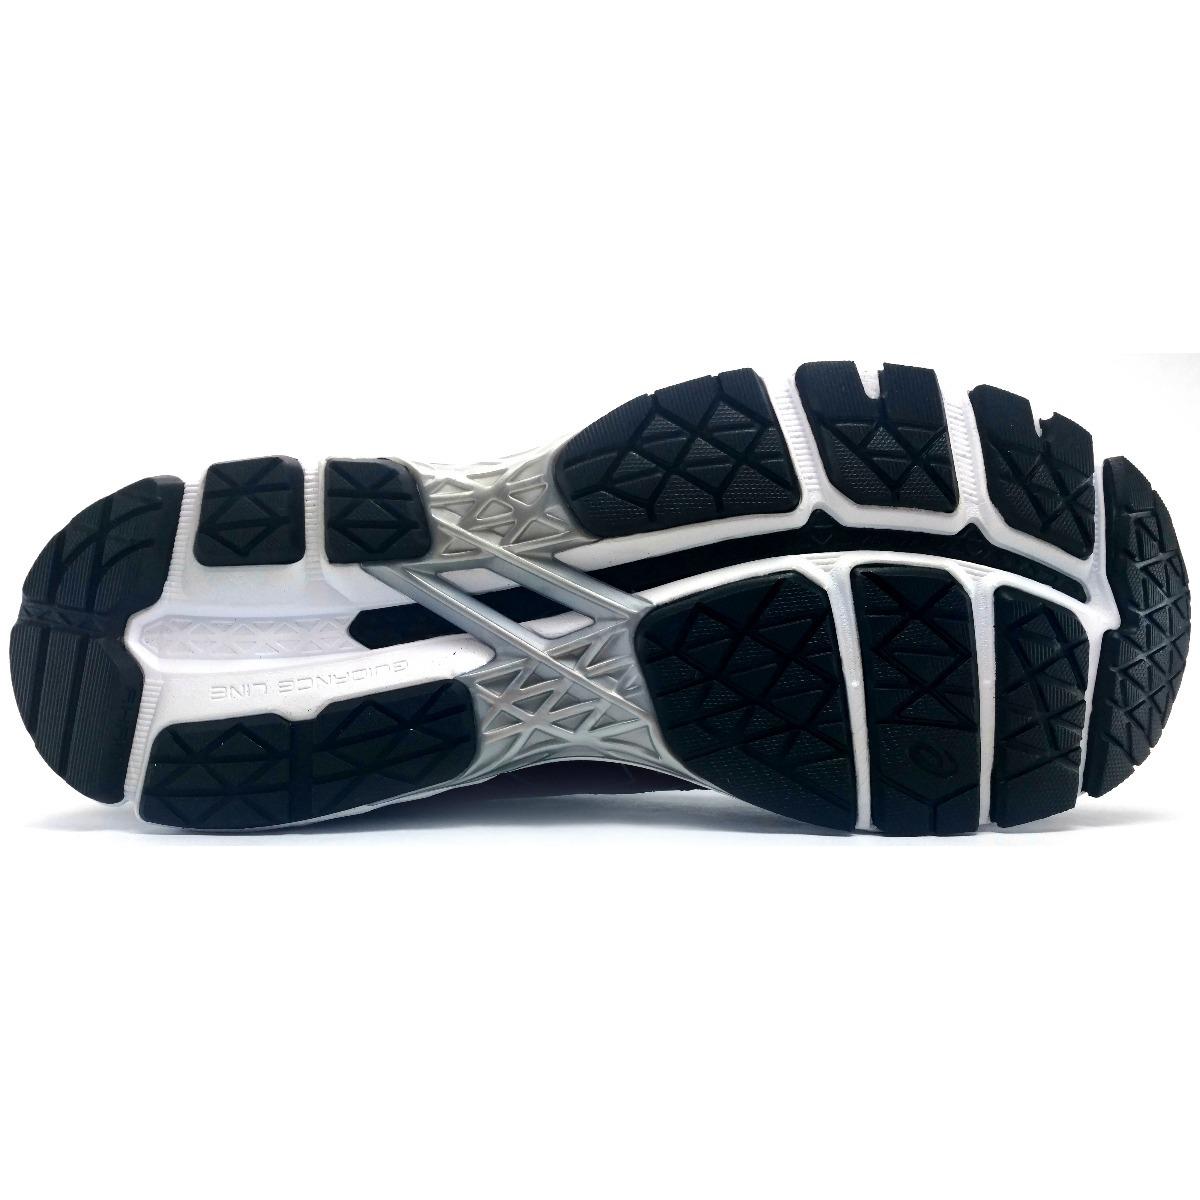 tenis asics gel surveyor 5 negro correr running pronador. Cargando zoom. eee9e1e345c4d